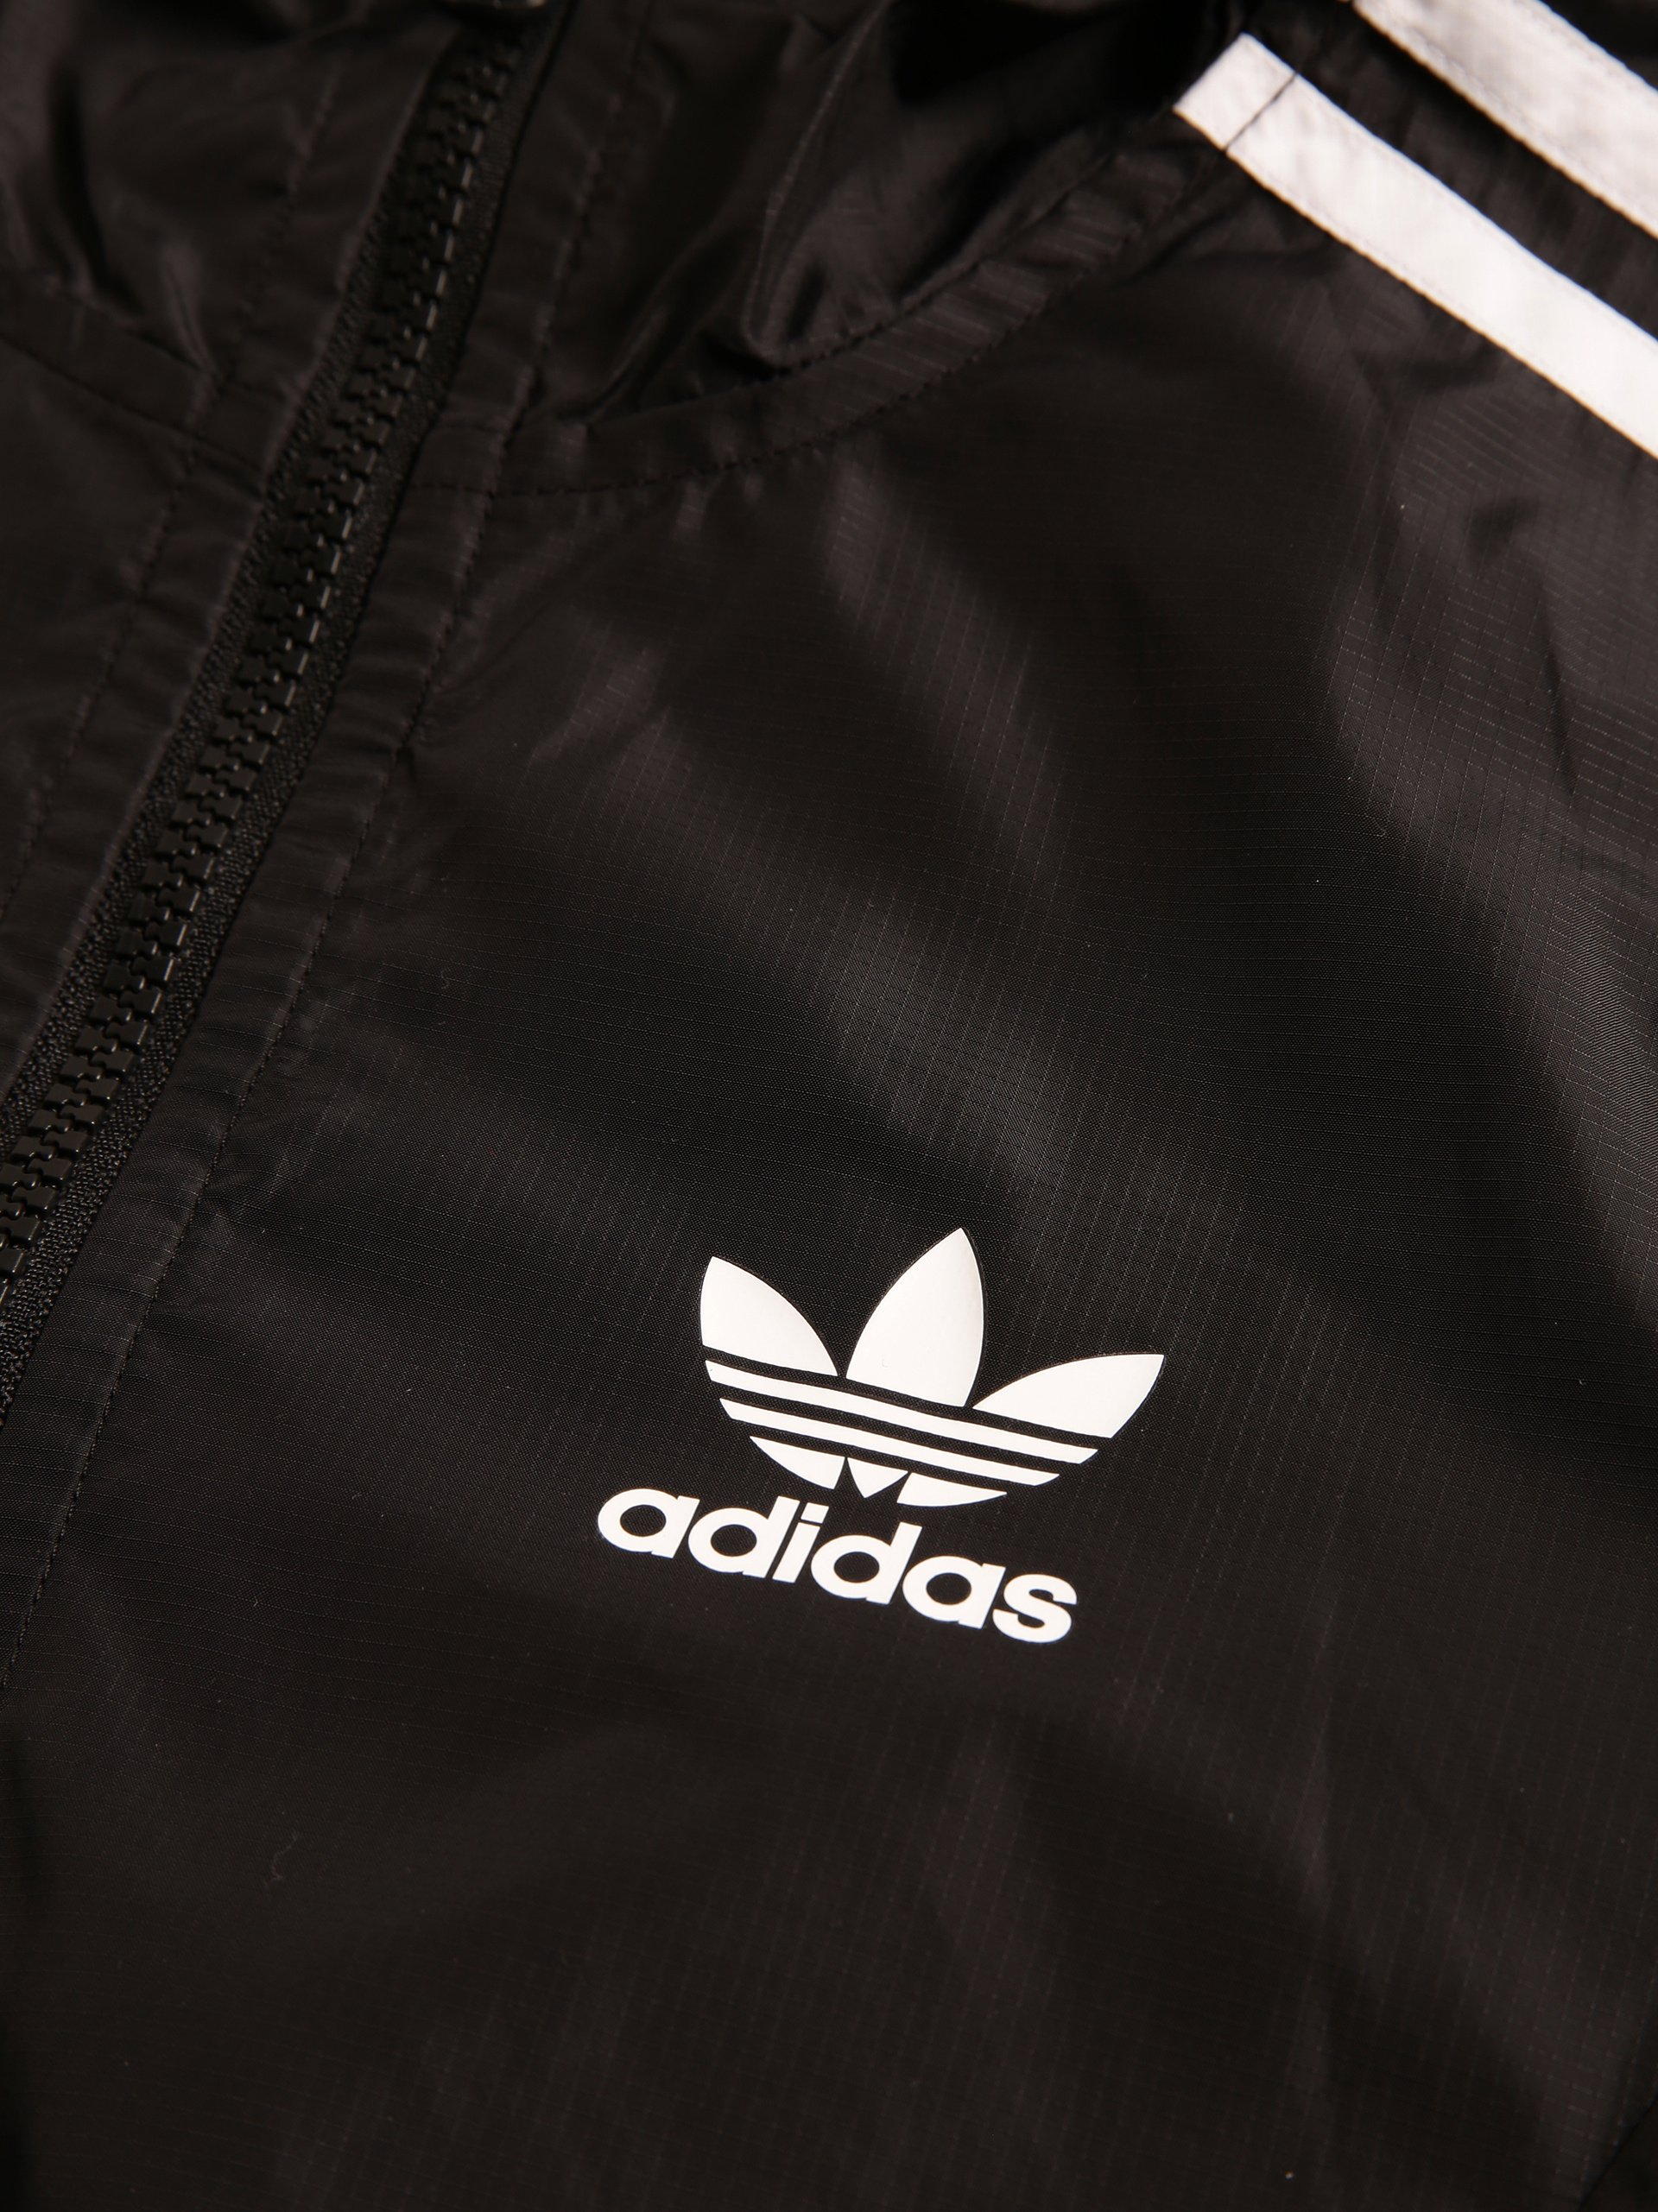 adidas Originals Jungen Jacke